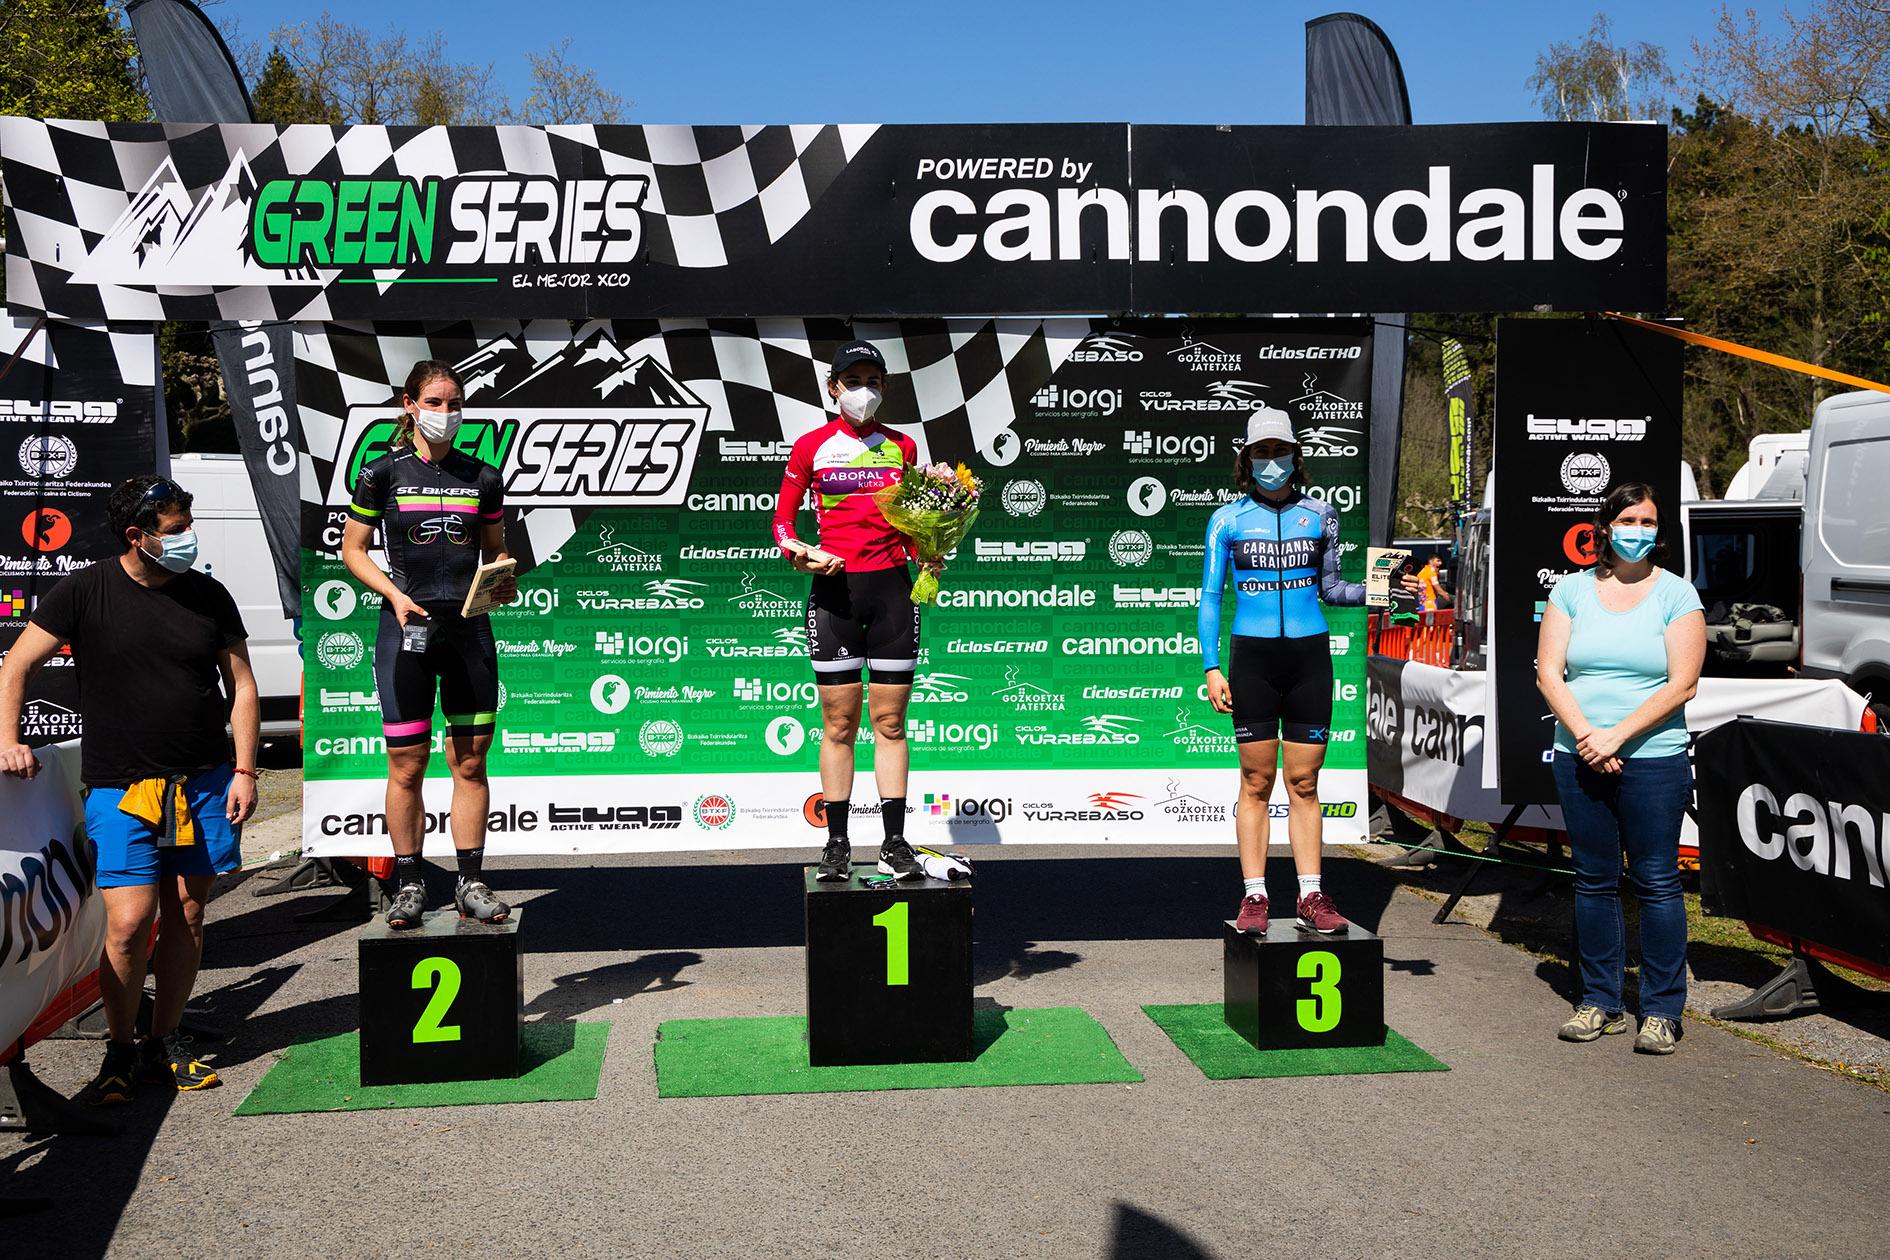 Green Series Challenge XC0 powered by Cannondale 1 Erandio Podium Elite Feminasjpg